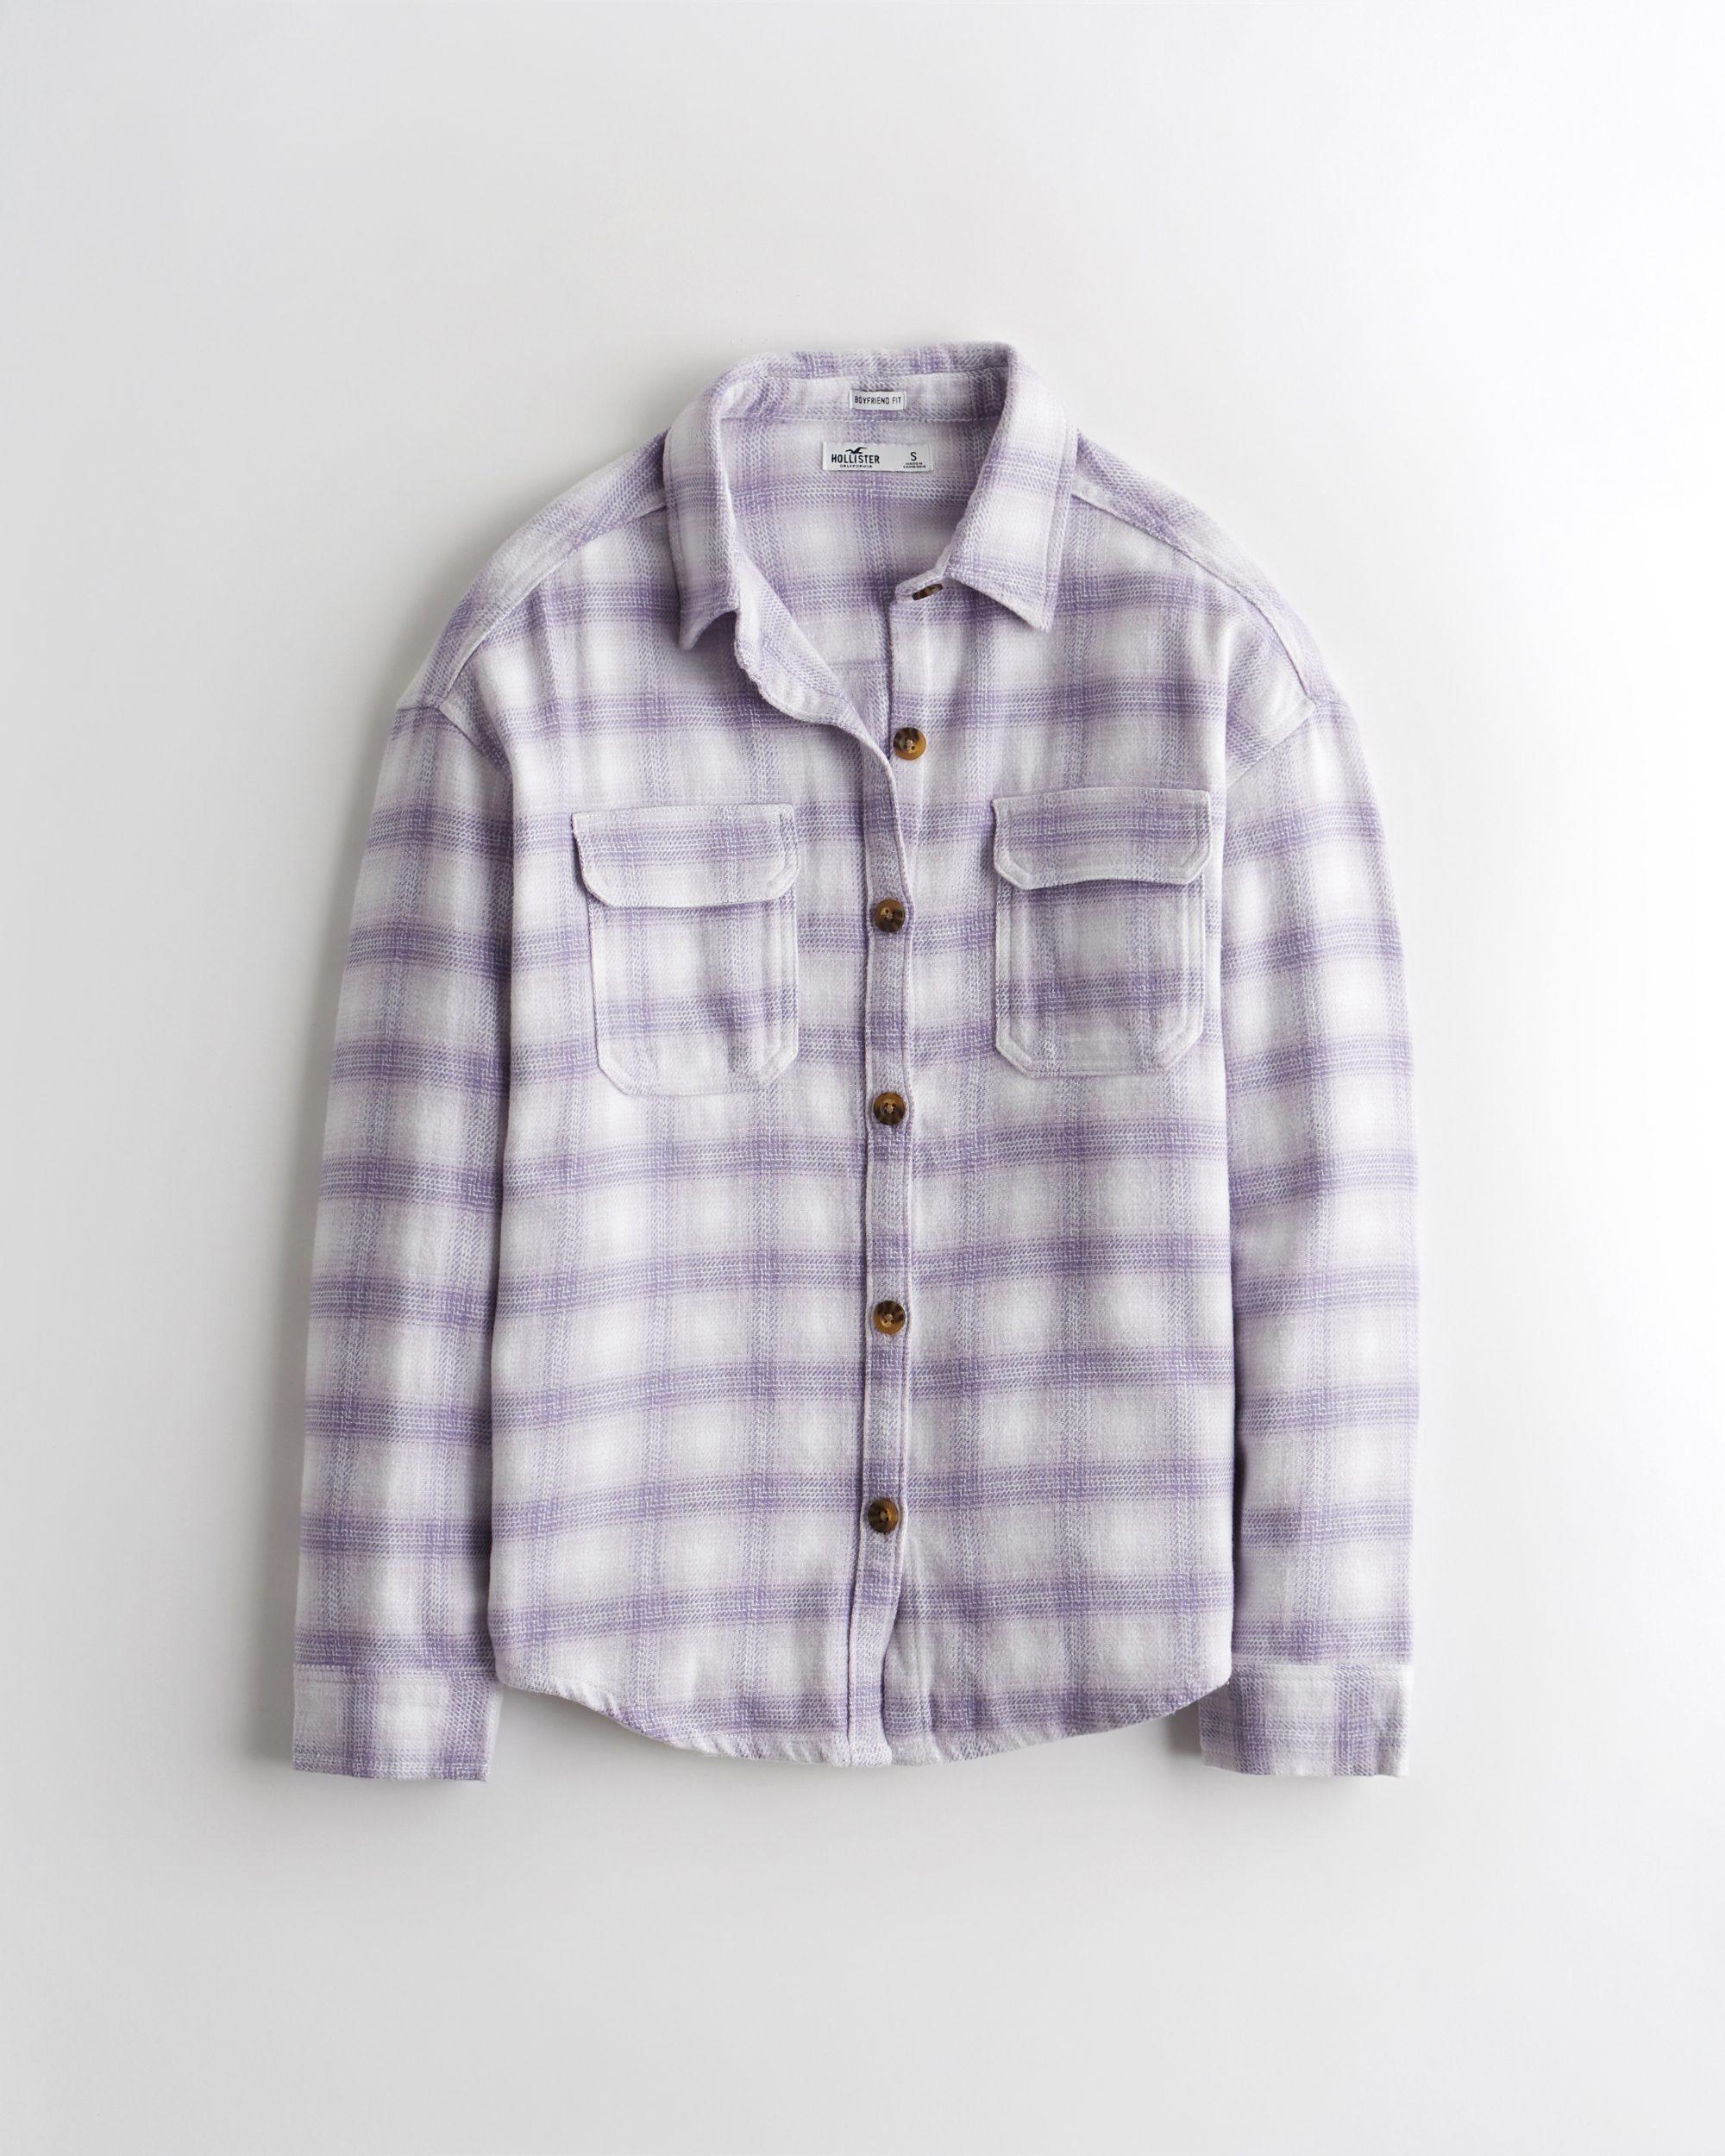 Oversized Flannel Shirt Jacket